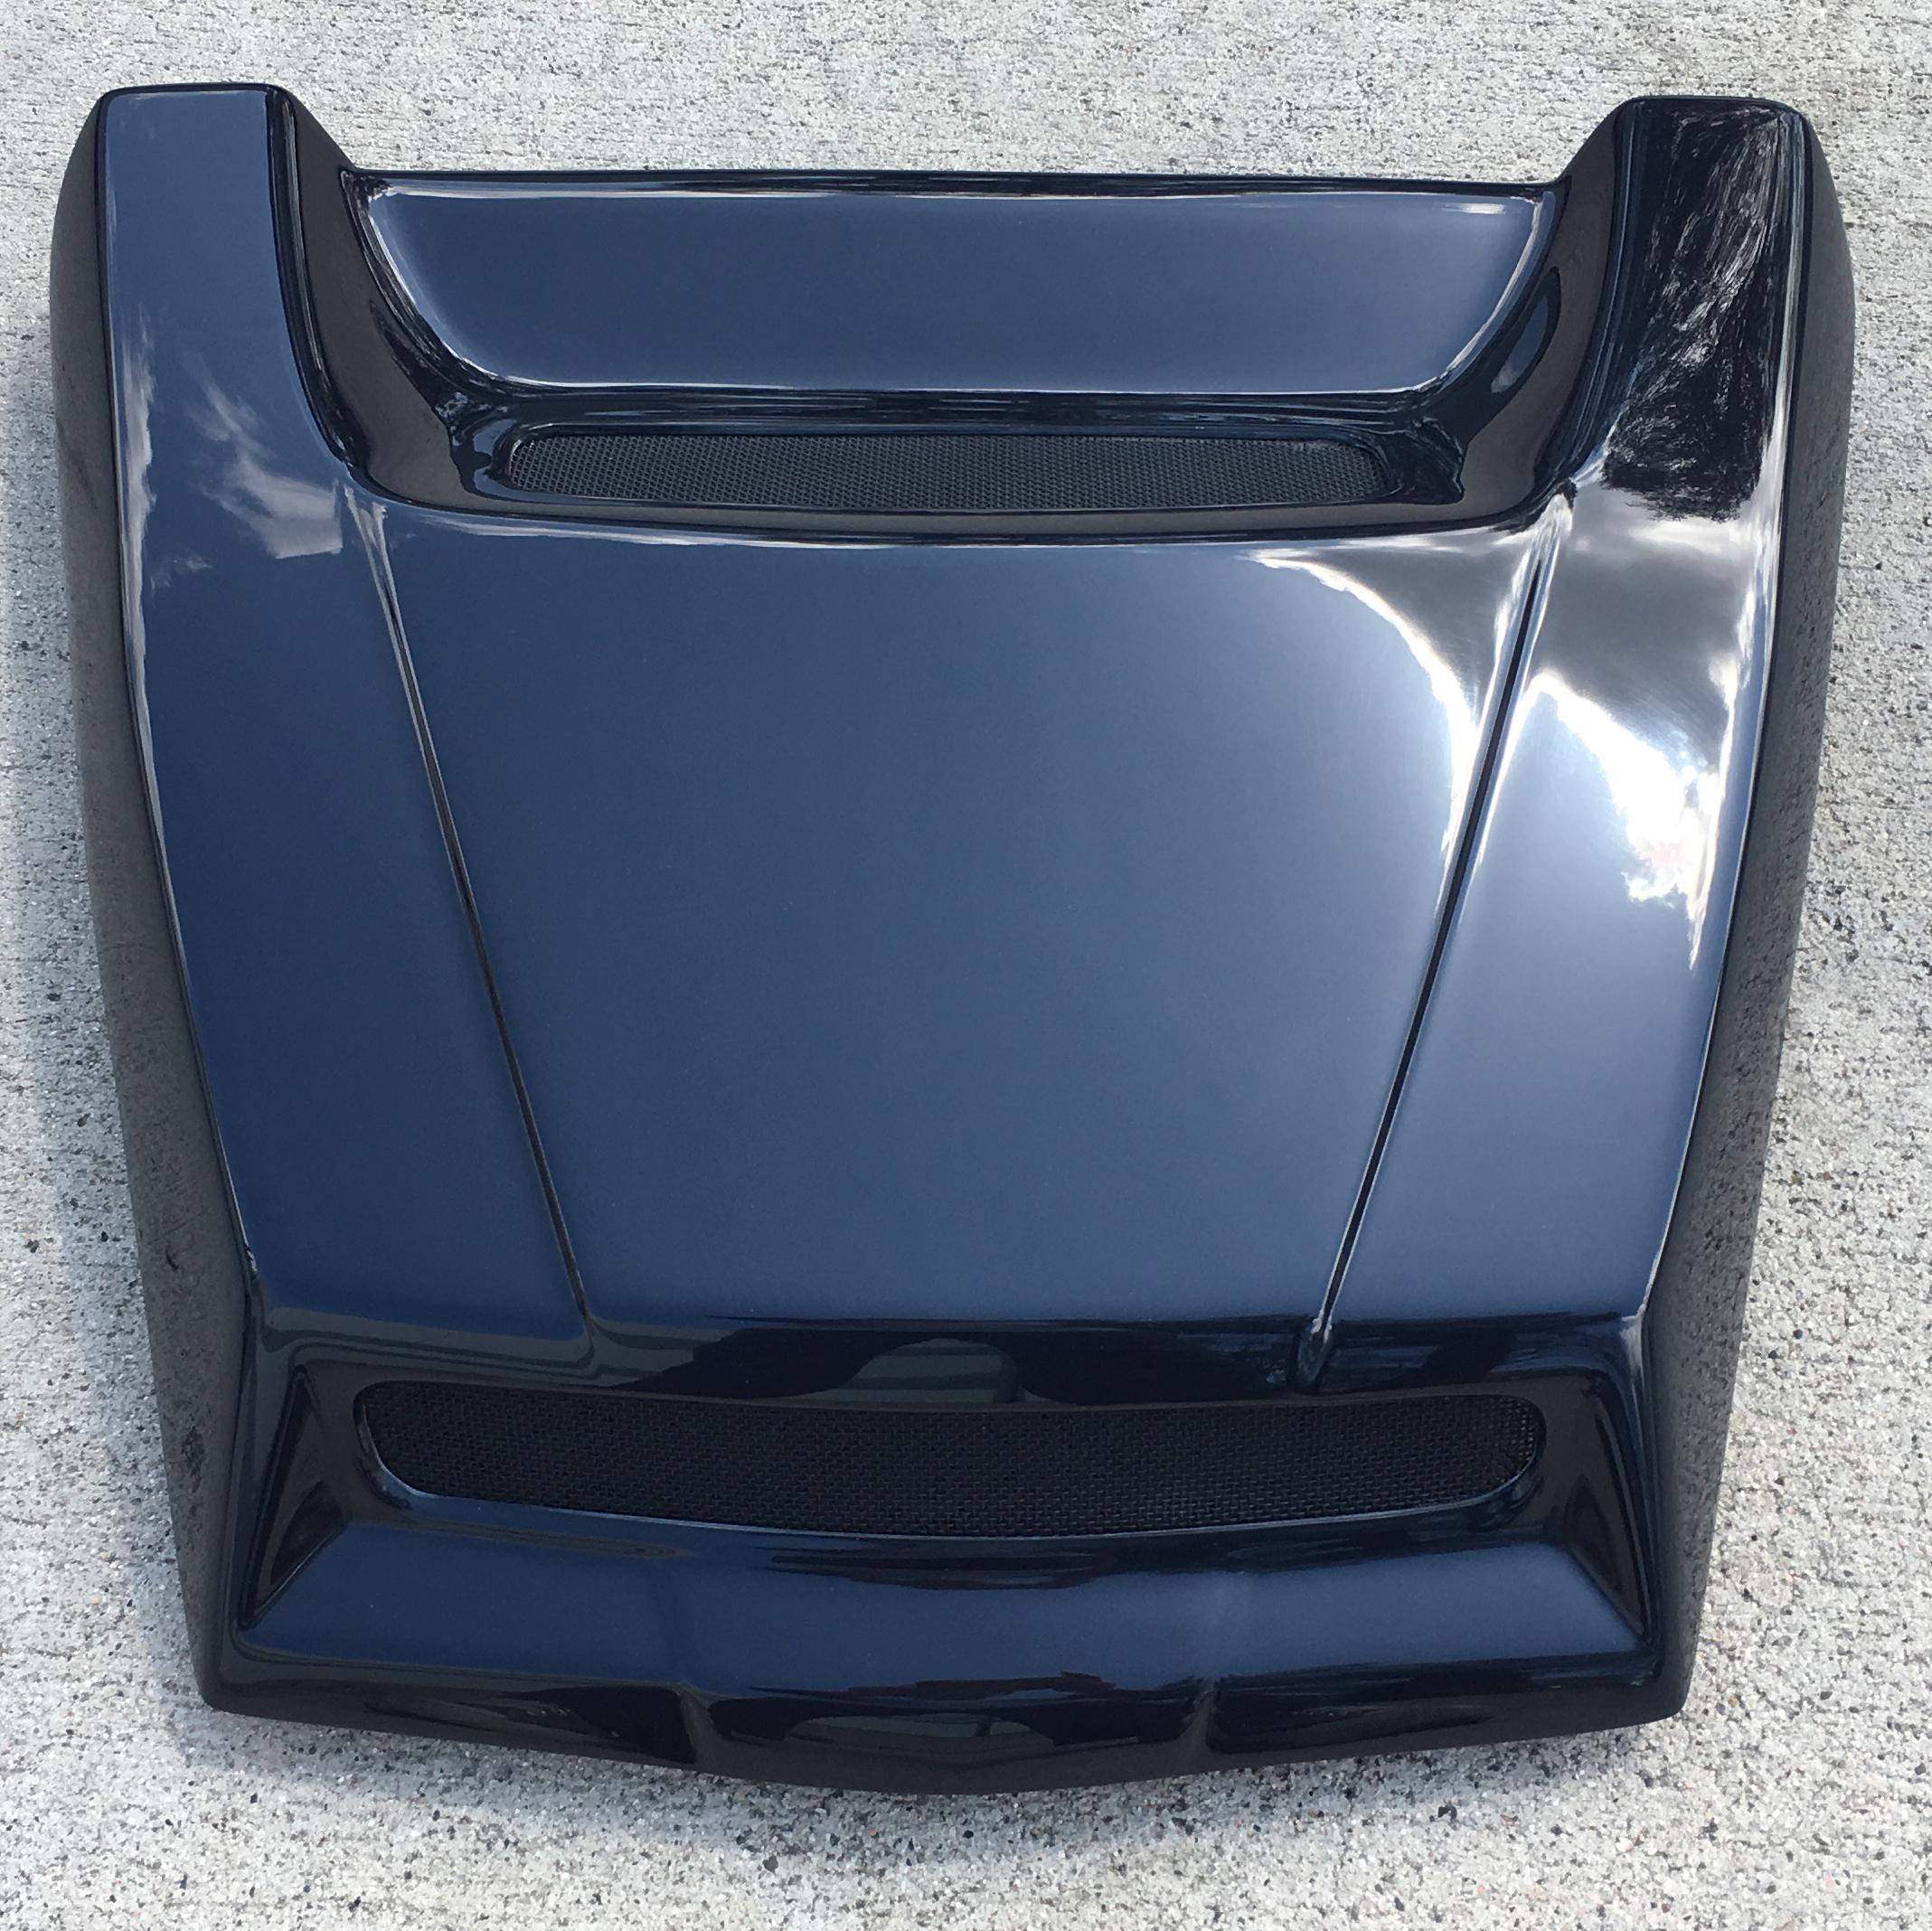 laveycraft rzr xp1000 hood top view.jpg